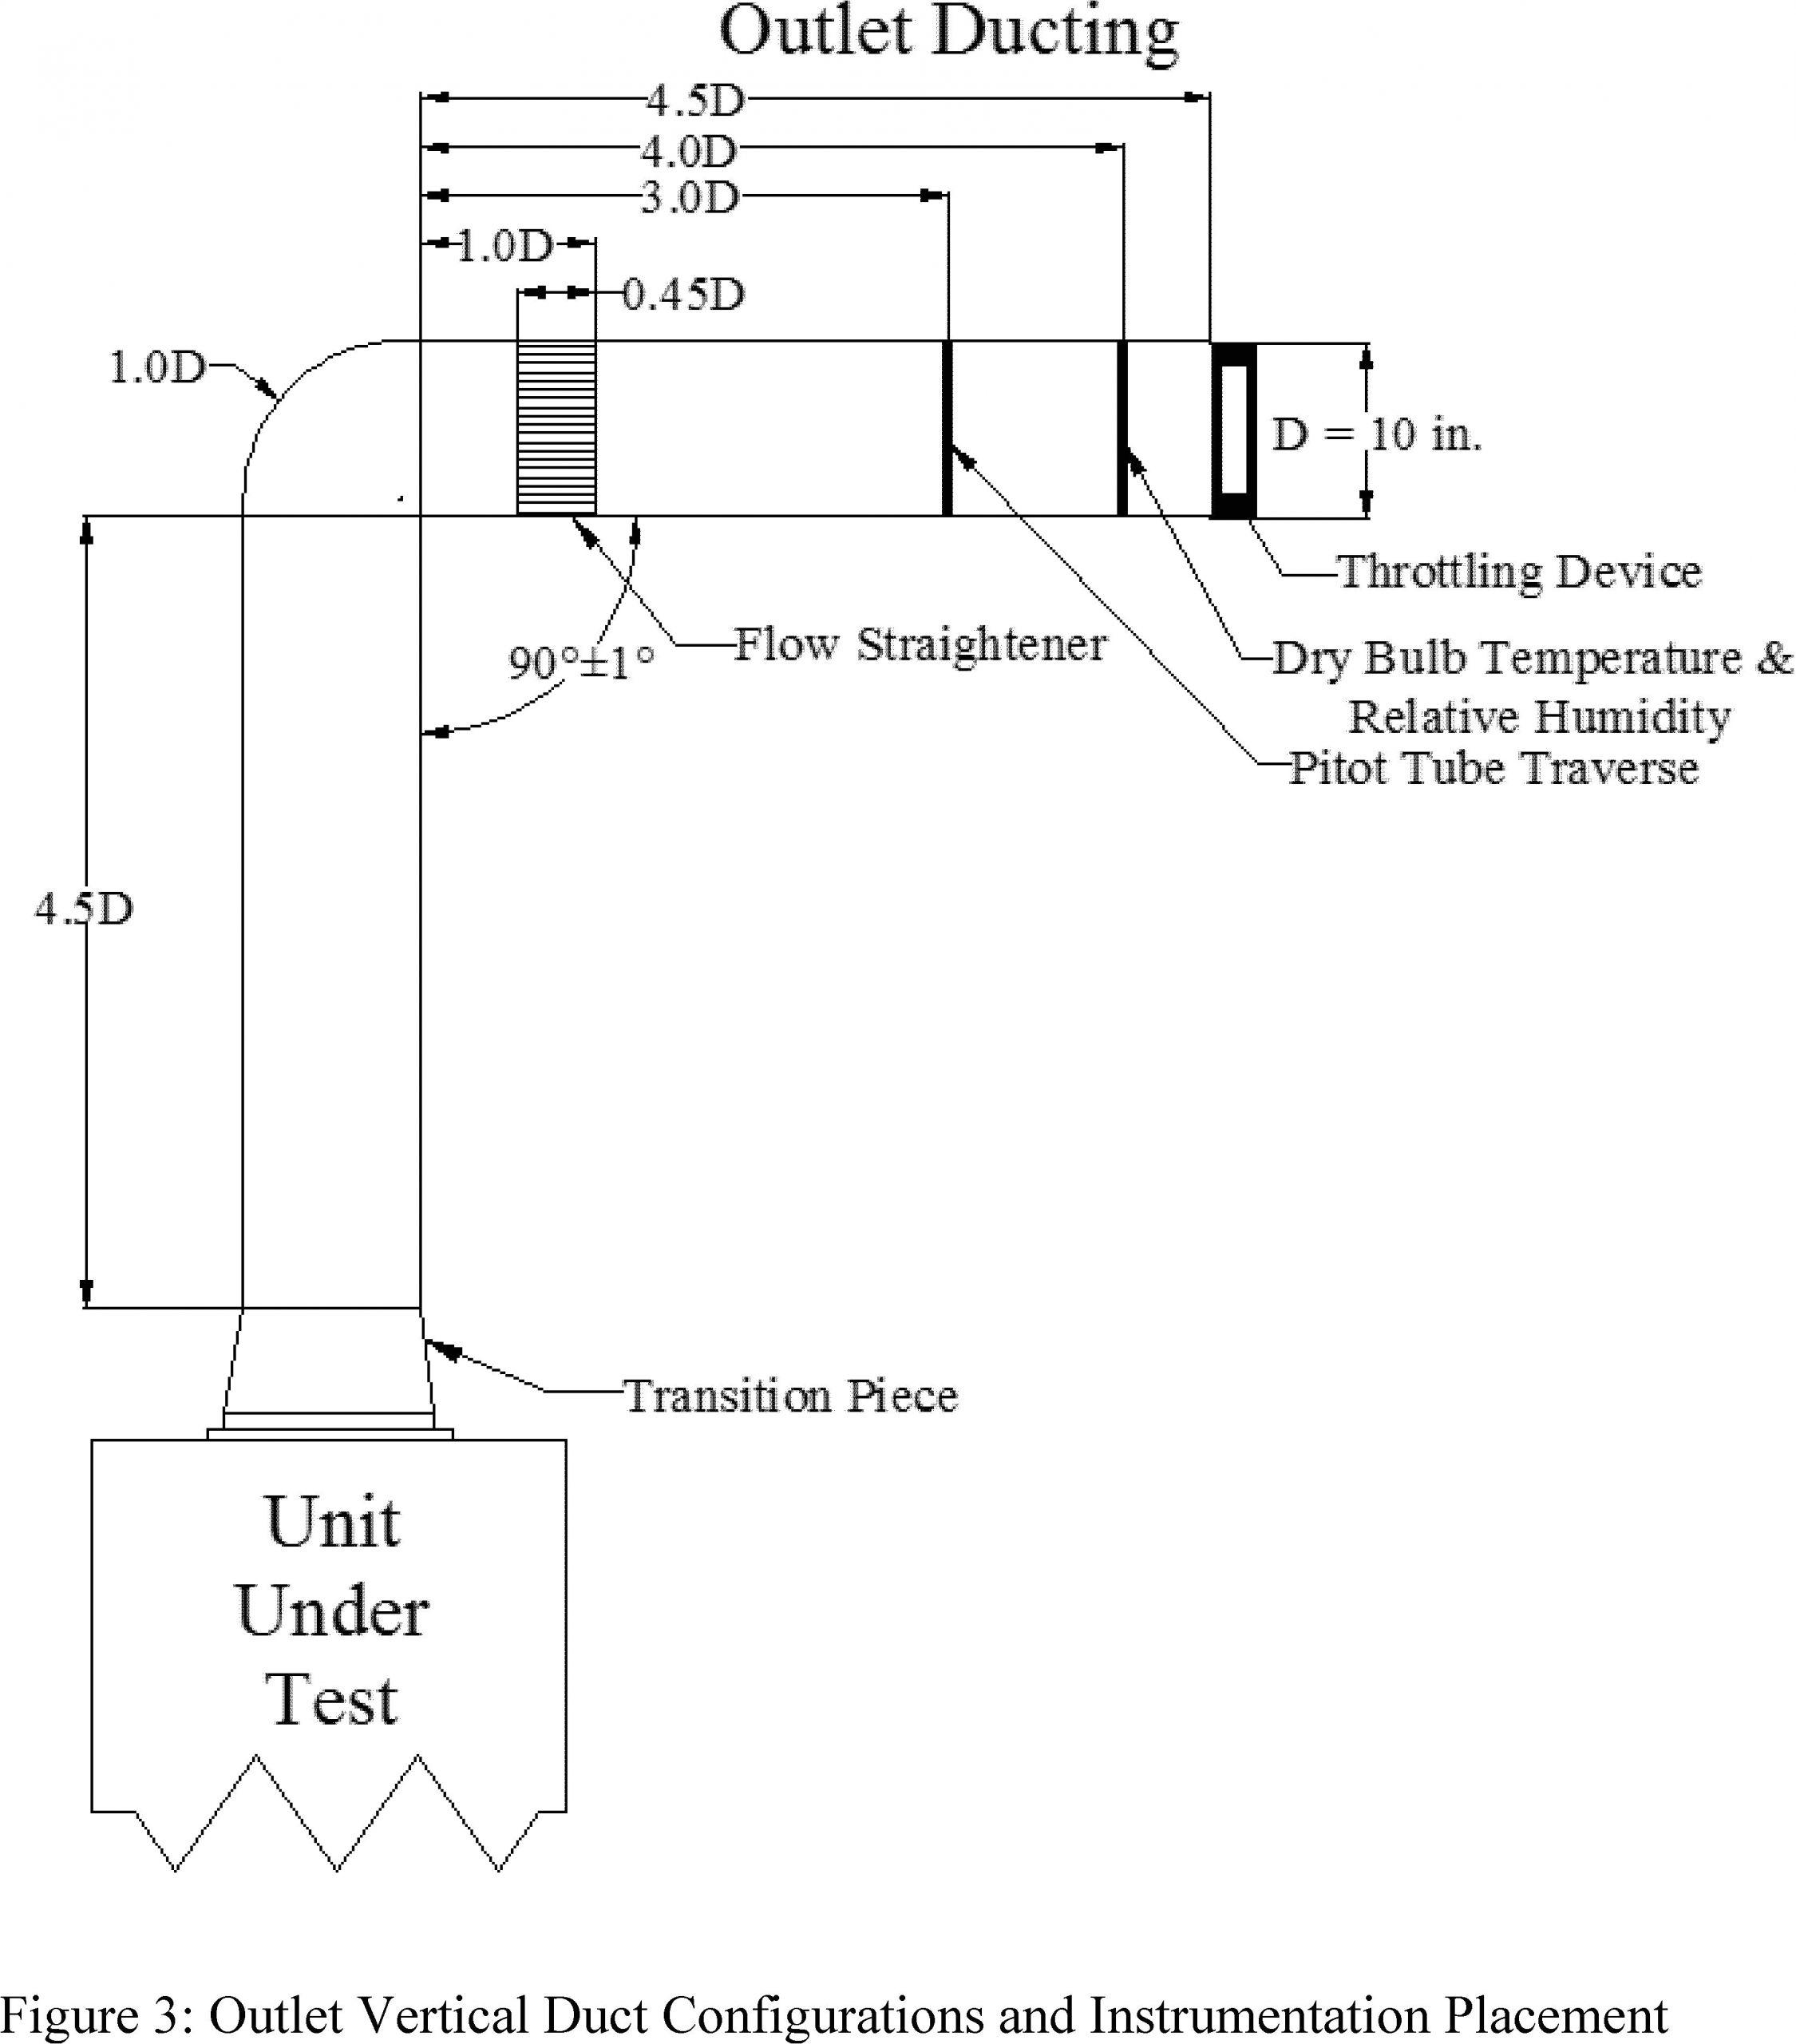 Leviton toggle Switch Wiring Diagram 5915 Leviton Dimmer Switch Wiring Diagram Leviton Gfci